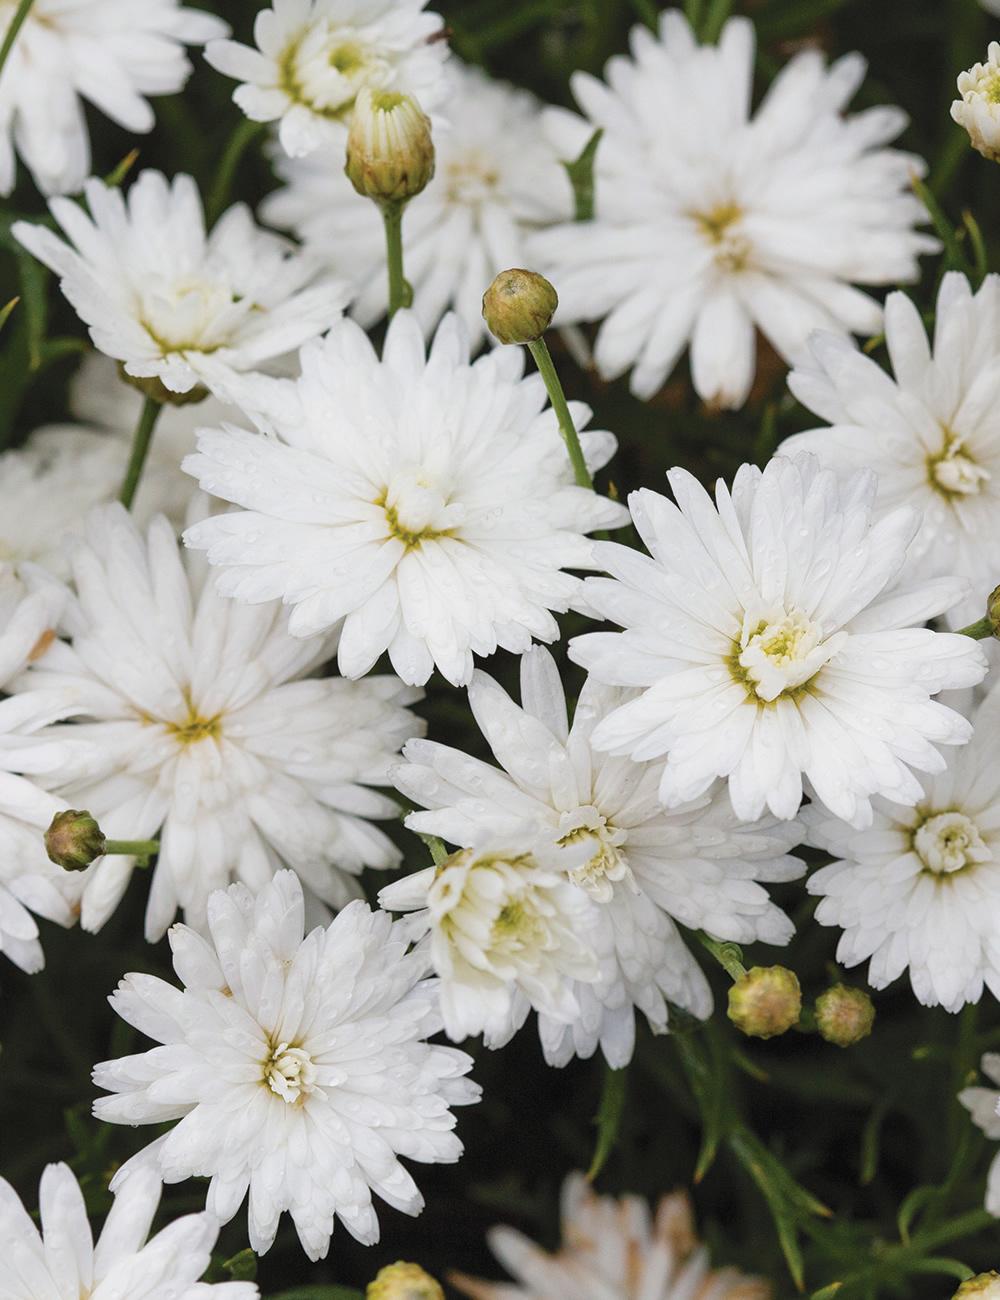 Marguerite daisies madeira double white tesselaar izmirmasajfo